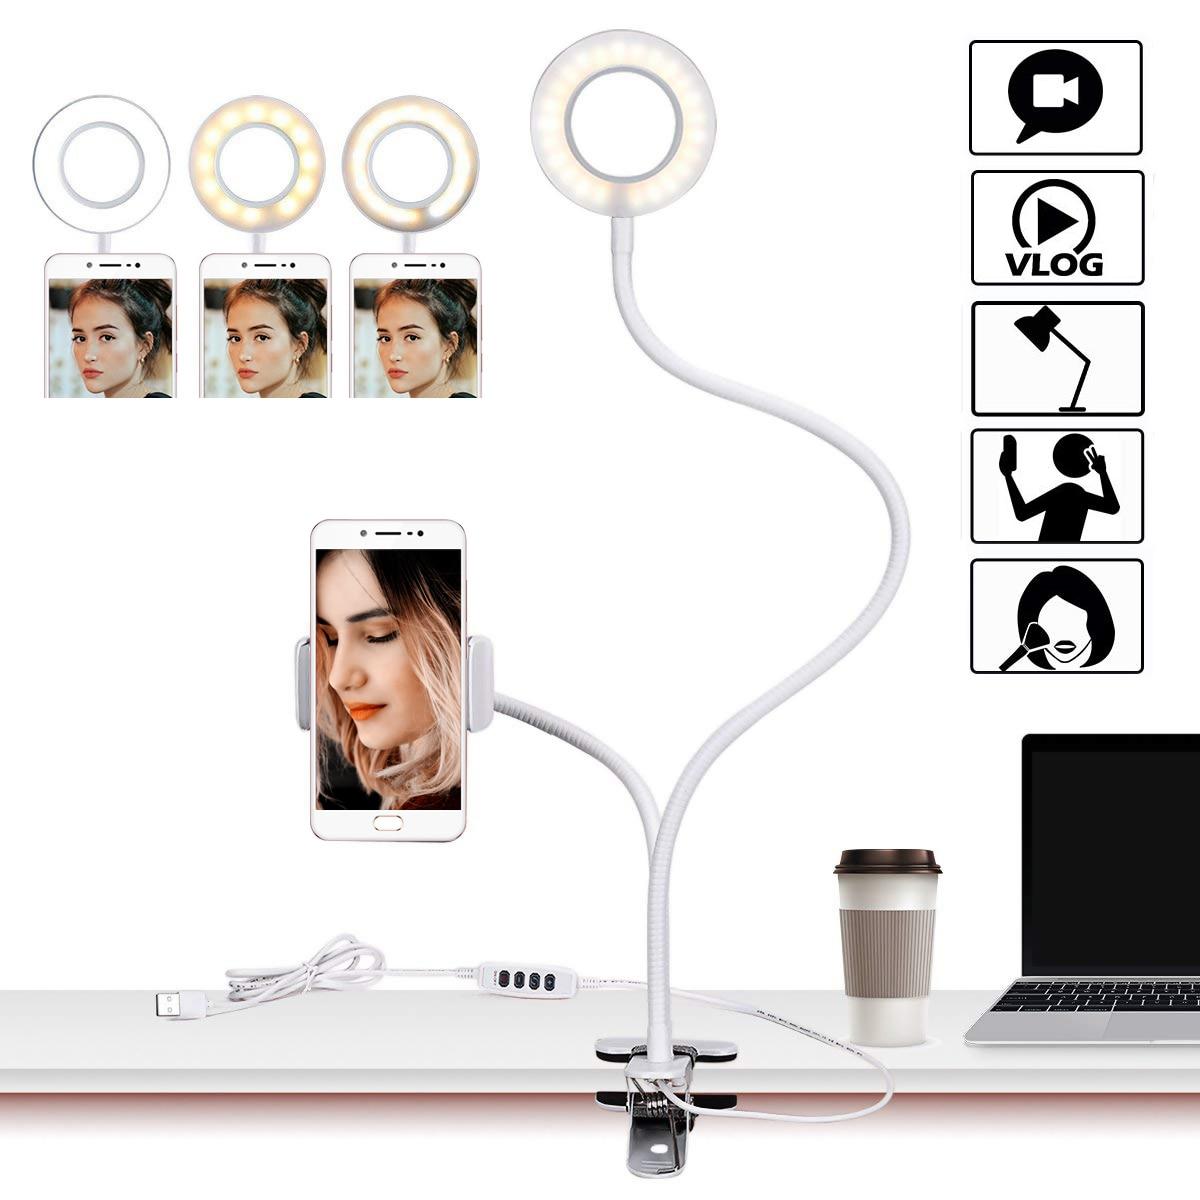 USB Led Table Lamp Multi-functional LED Ring Light With Flexible Mobile Phone Holder For Youtube Live Stream Makeup Camera Lamp